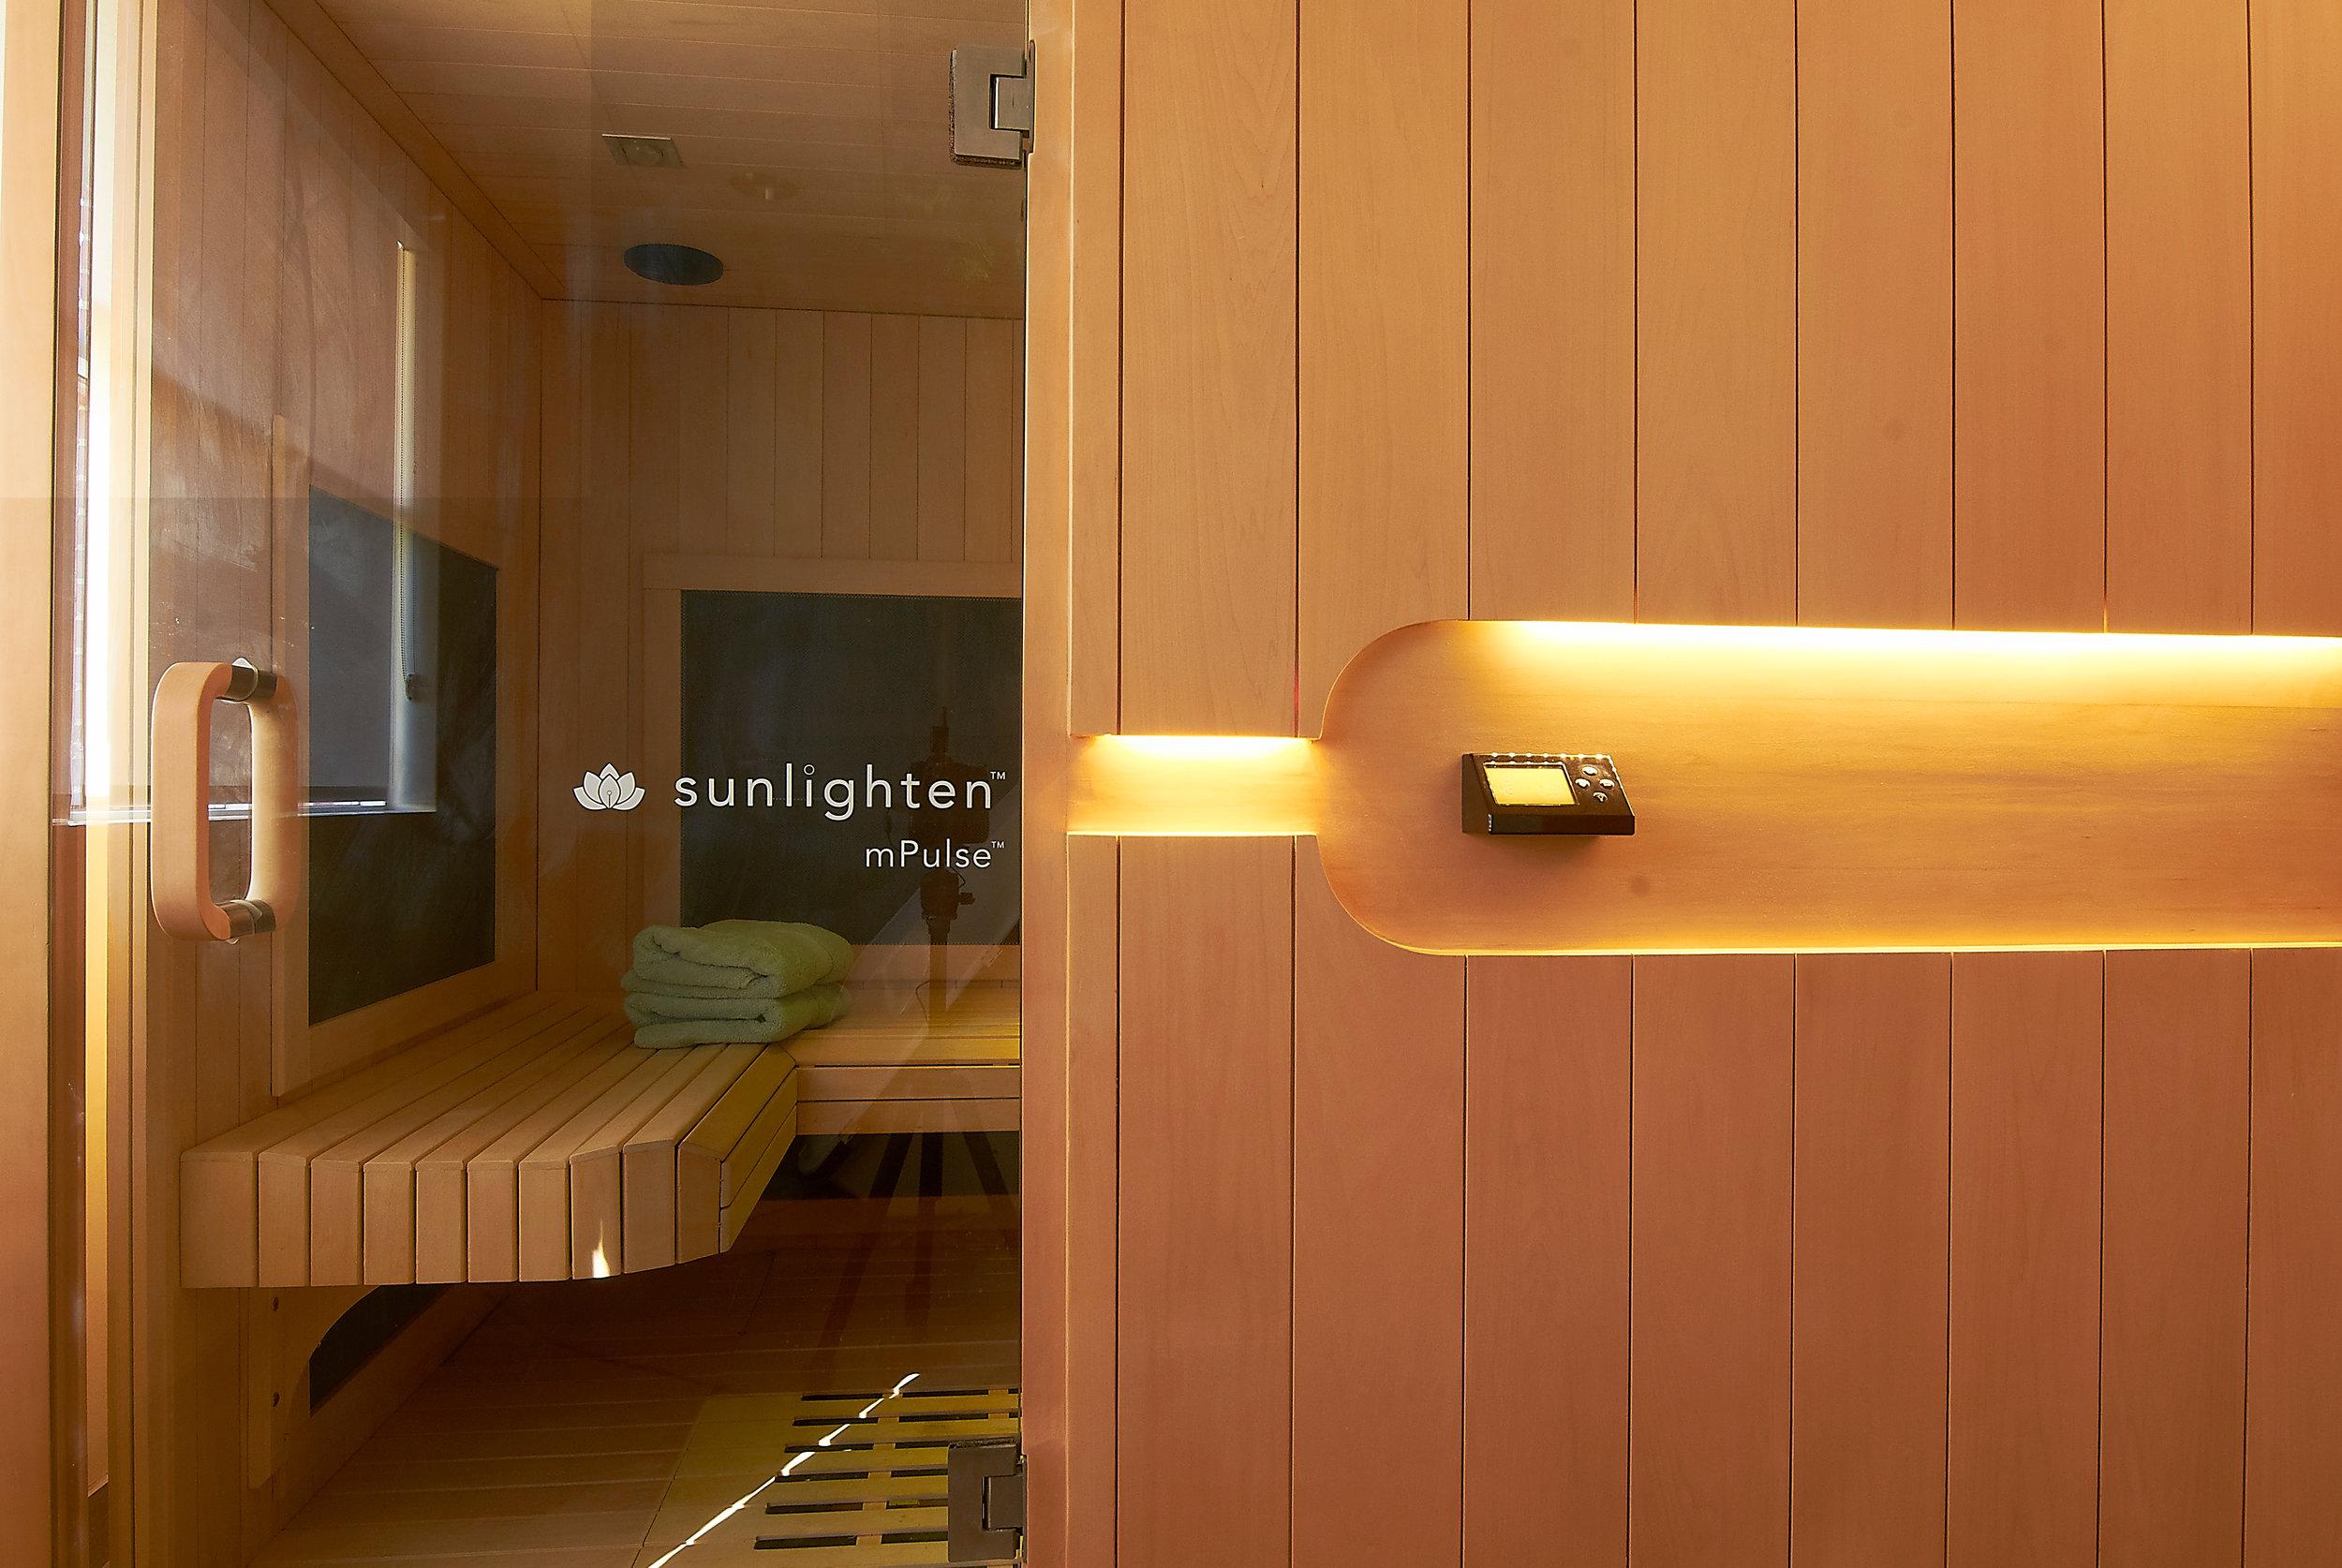 Sunlighten 1.jpg